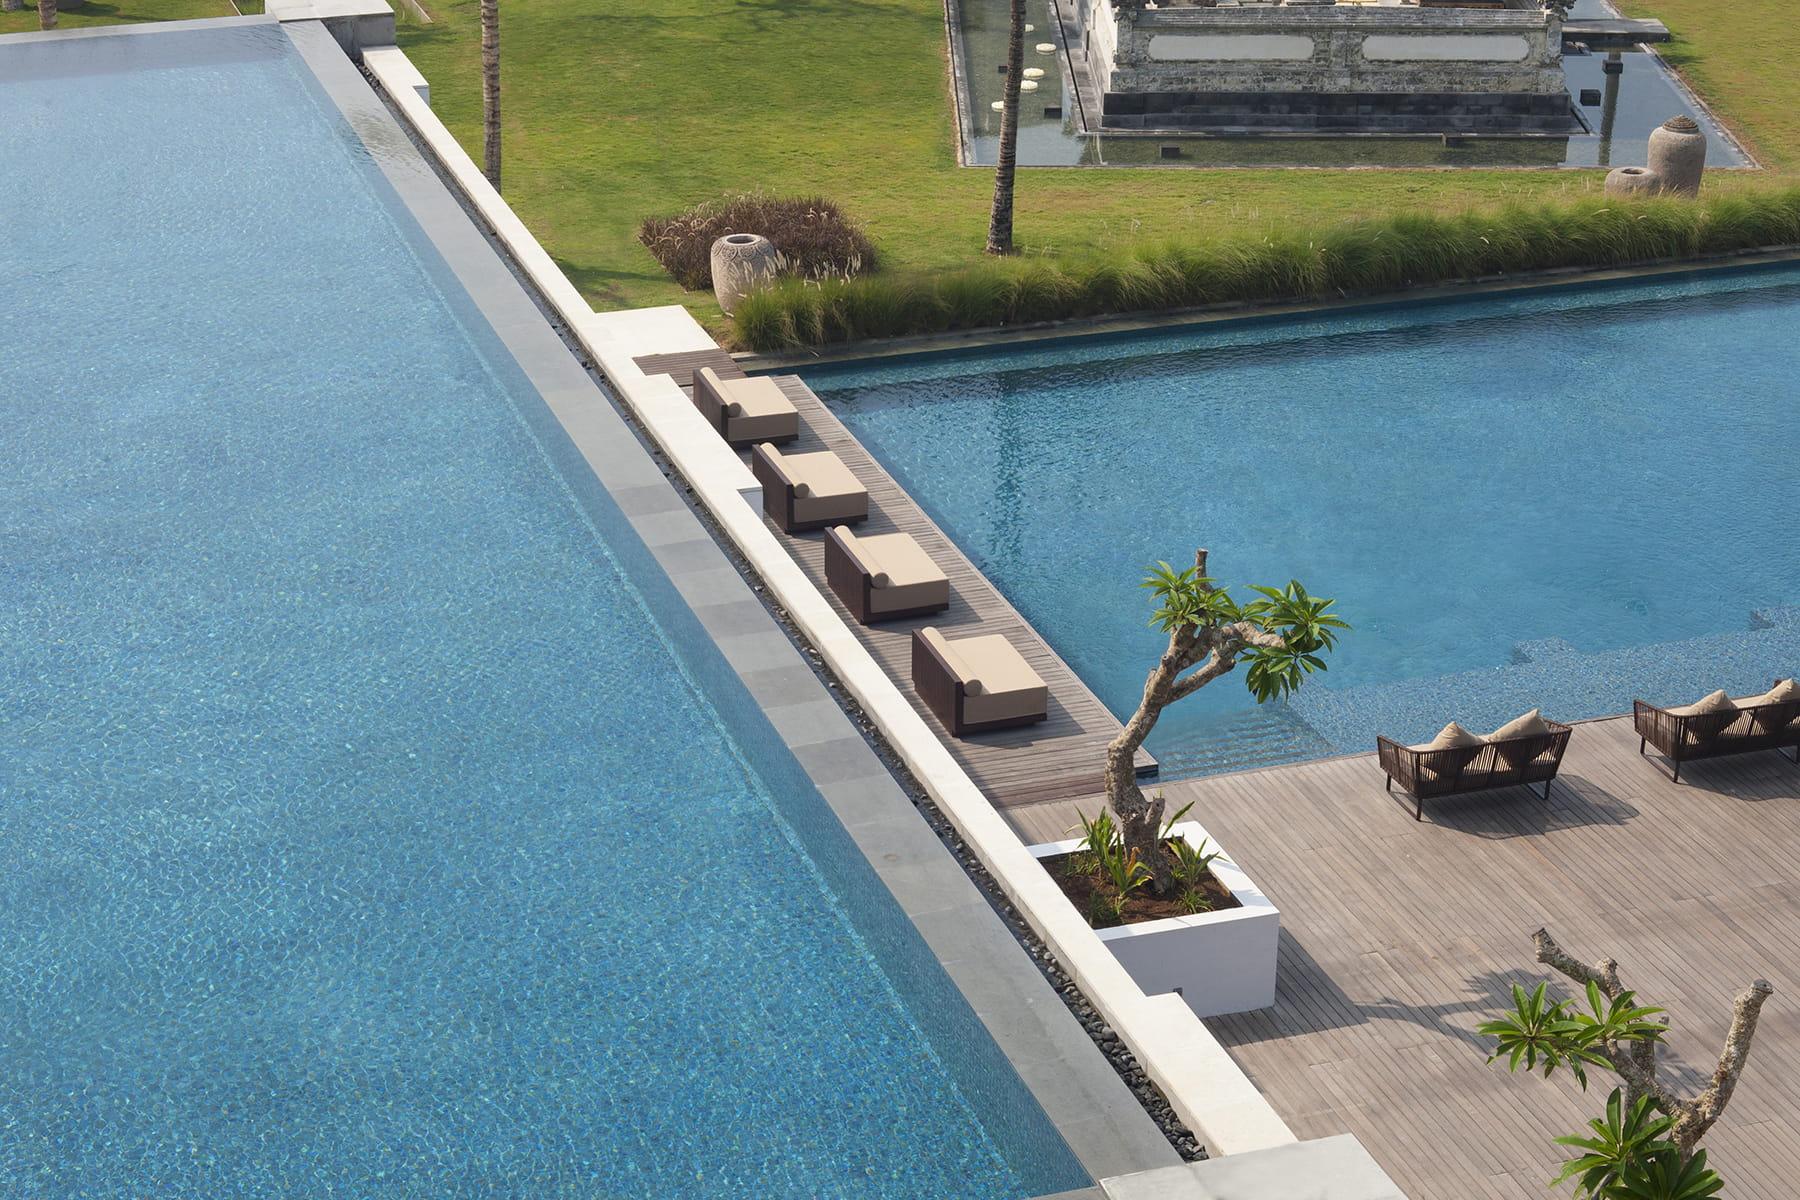 Alila seminyak petit ou grand bassin ces piscines for Petit bassin piscine